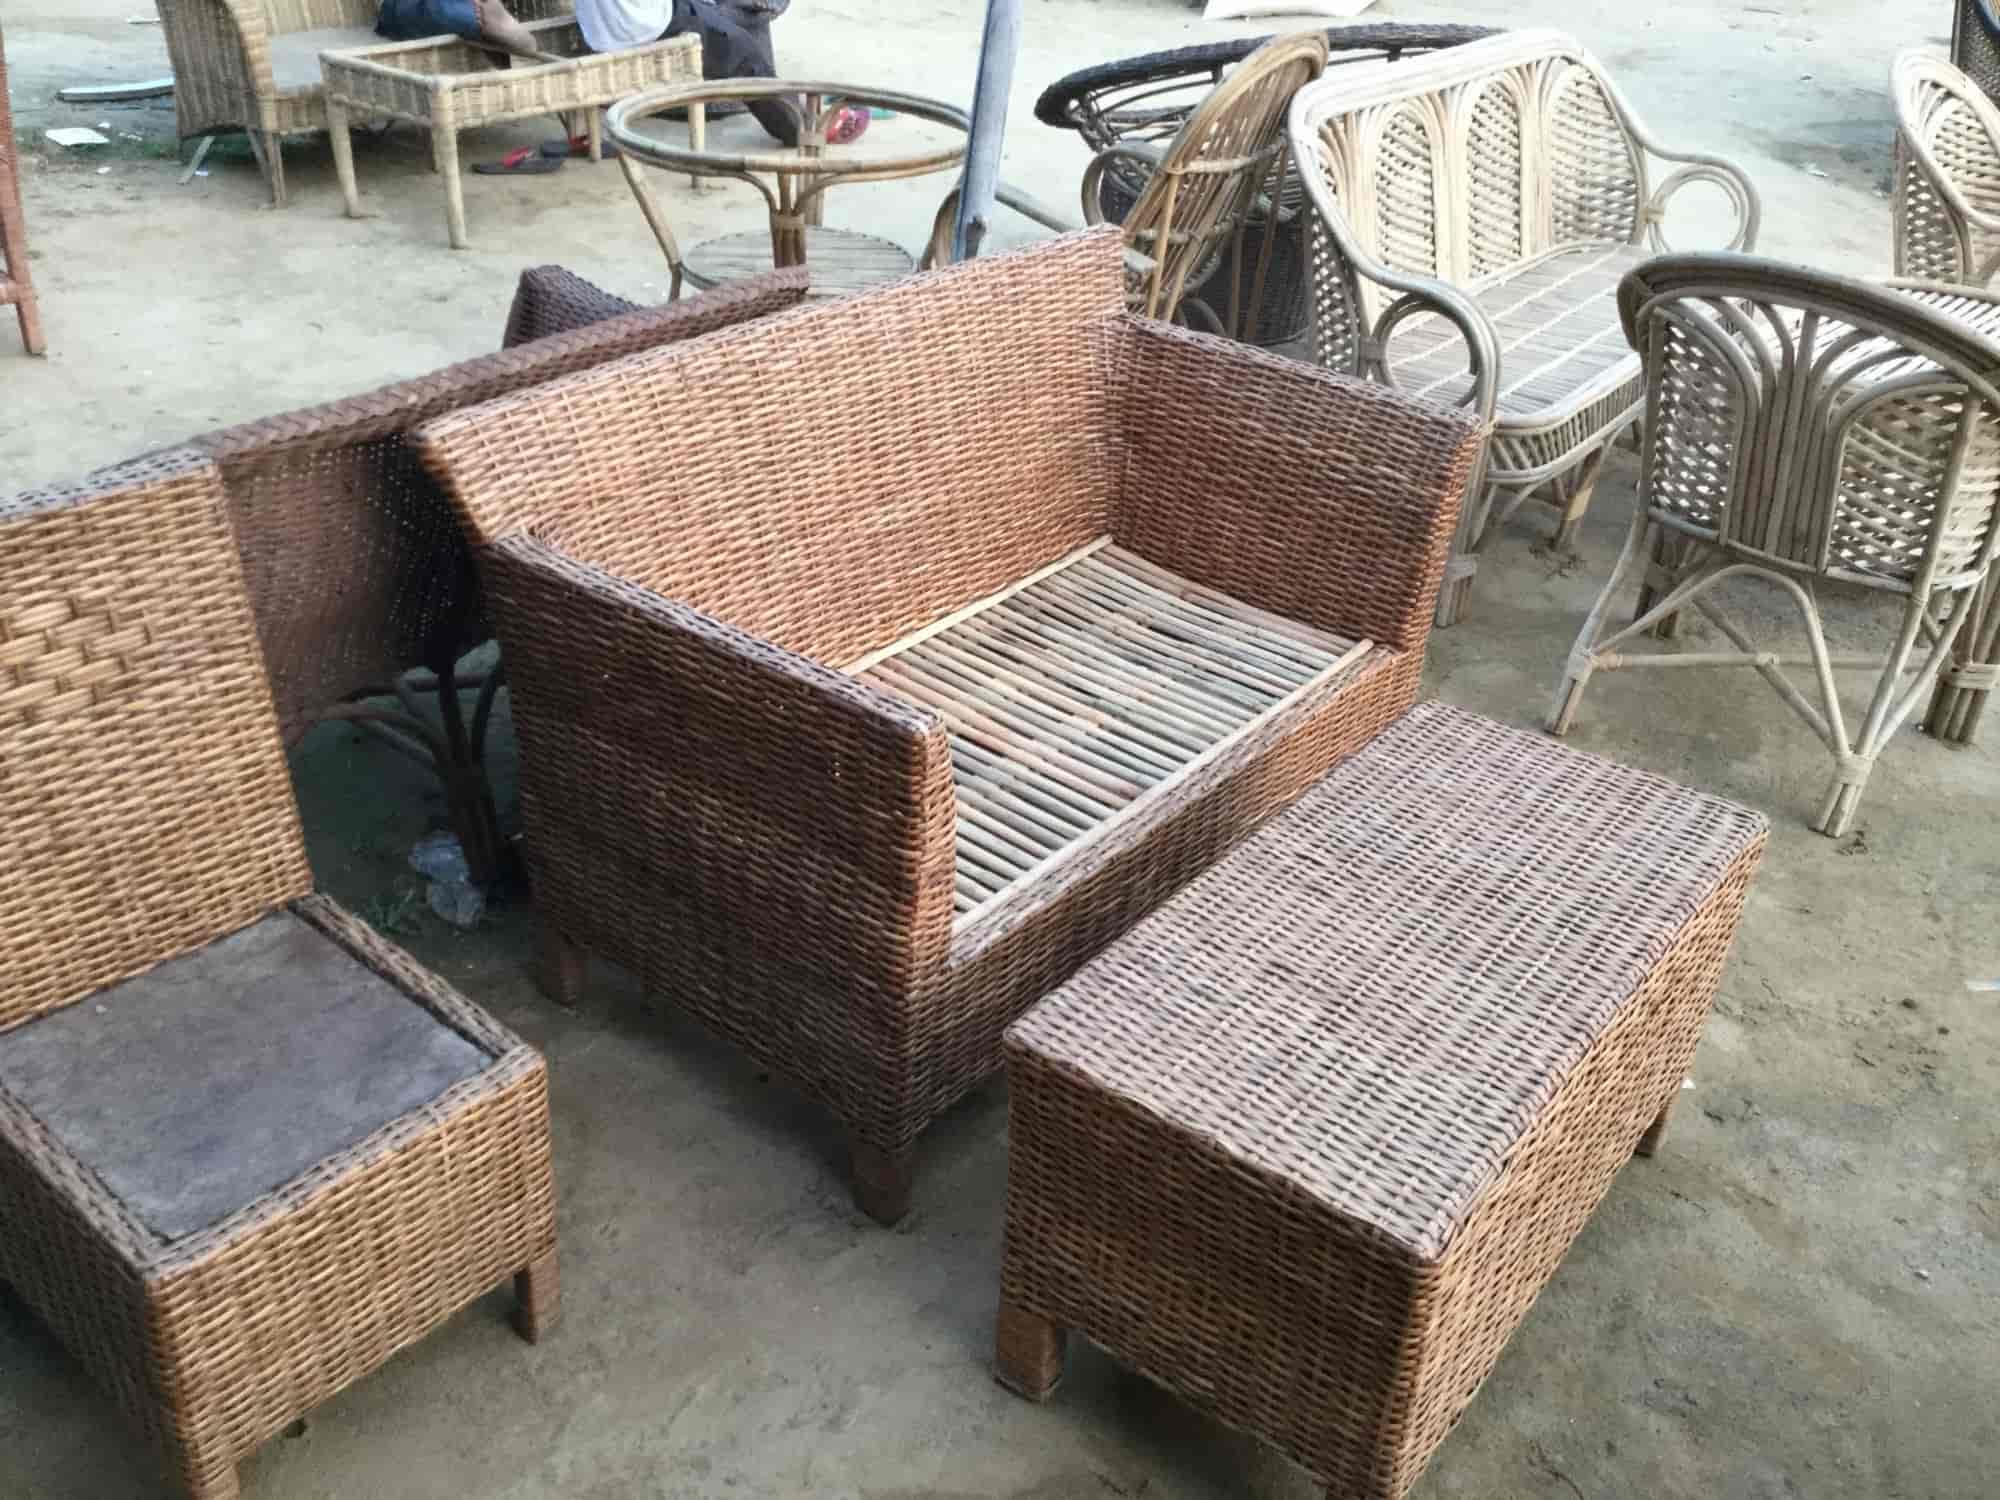 sanjay cane furniture photos sikandarpur gurgaon delhi pictures